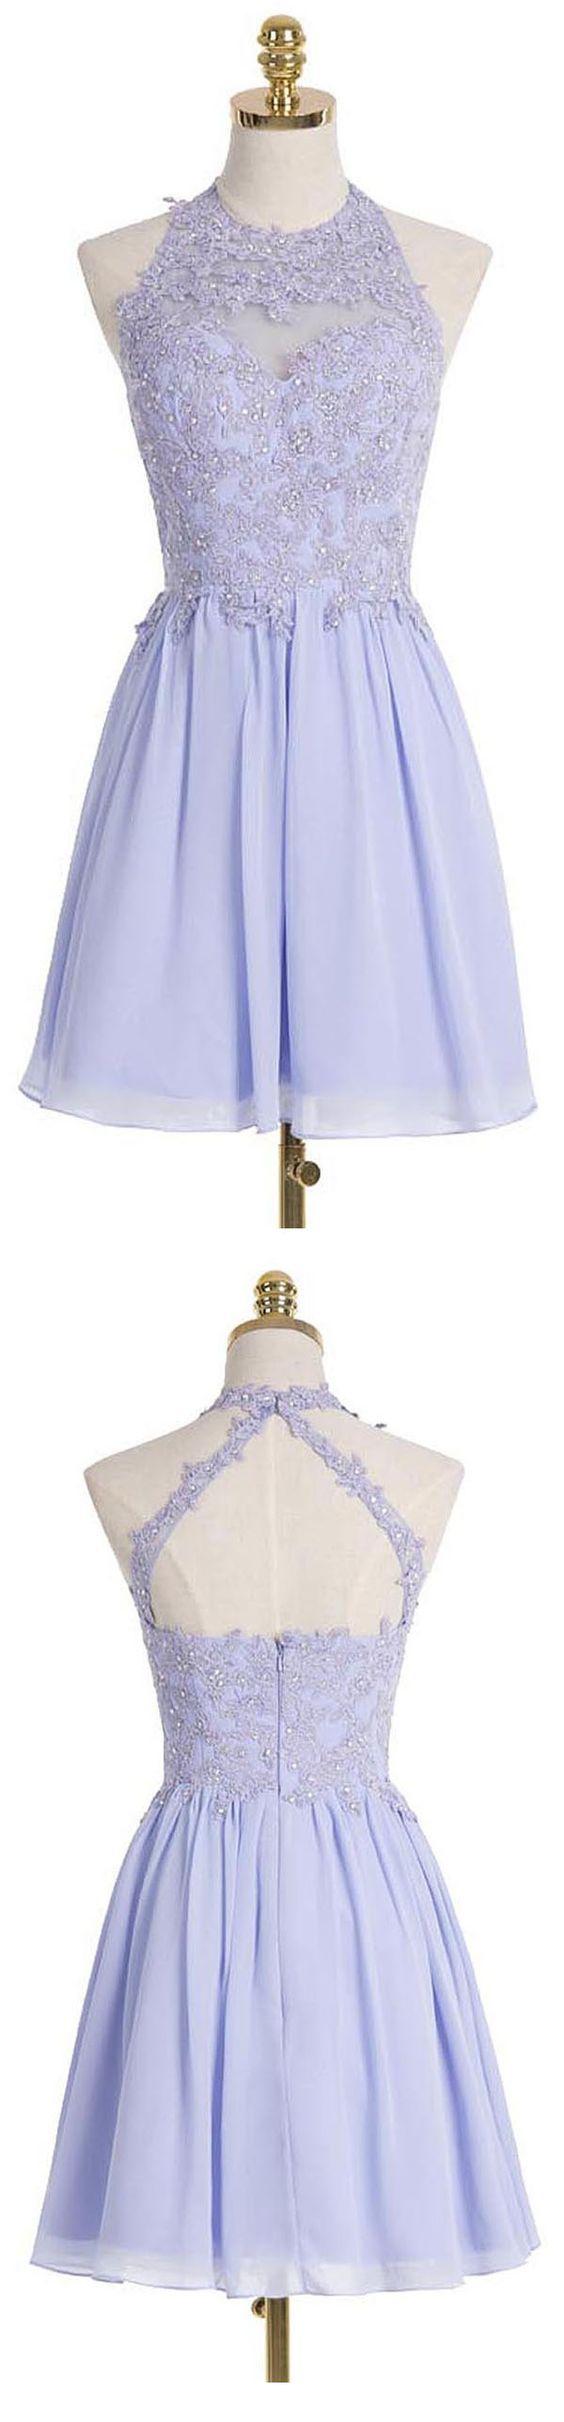 Charming prom dresschiffon prom dressesshort homecoming dresssexy